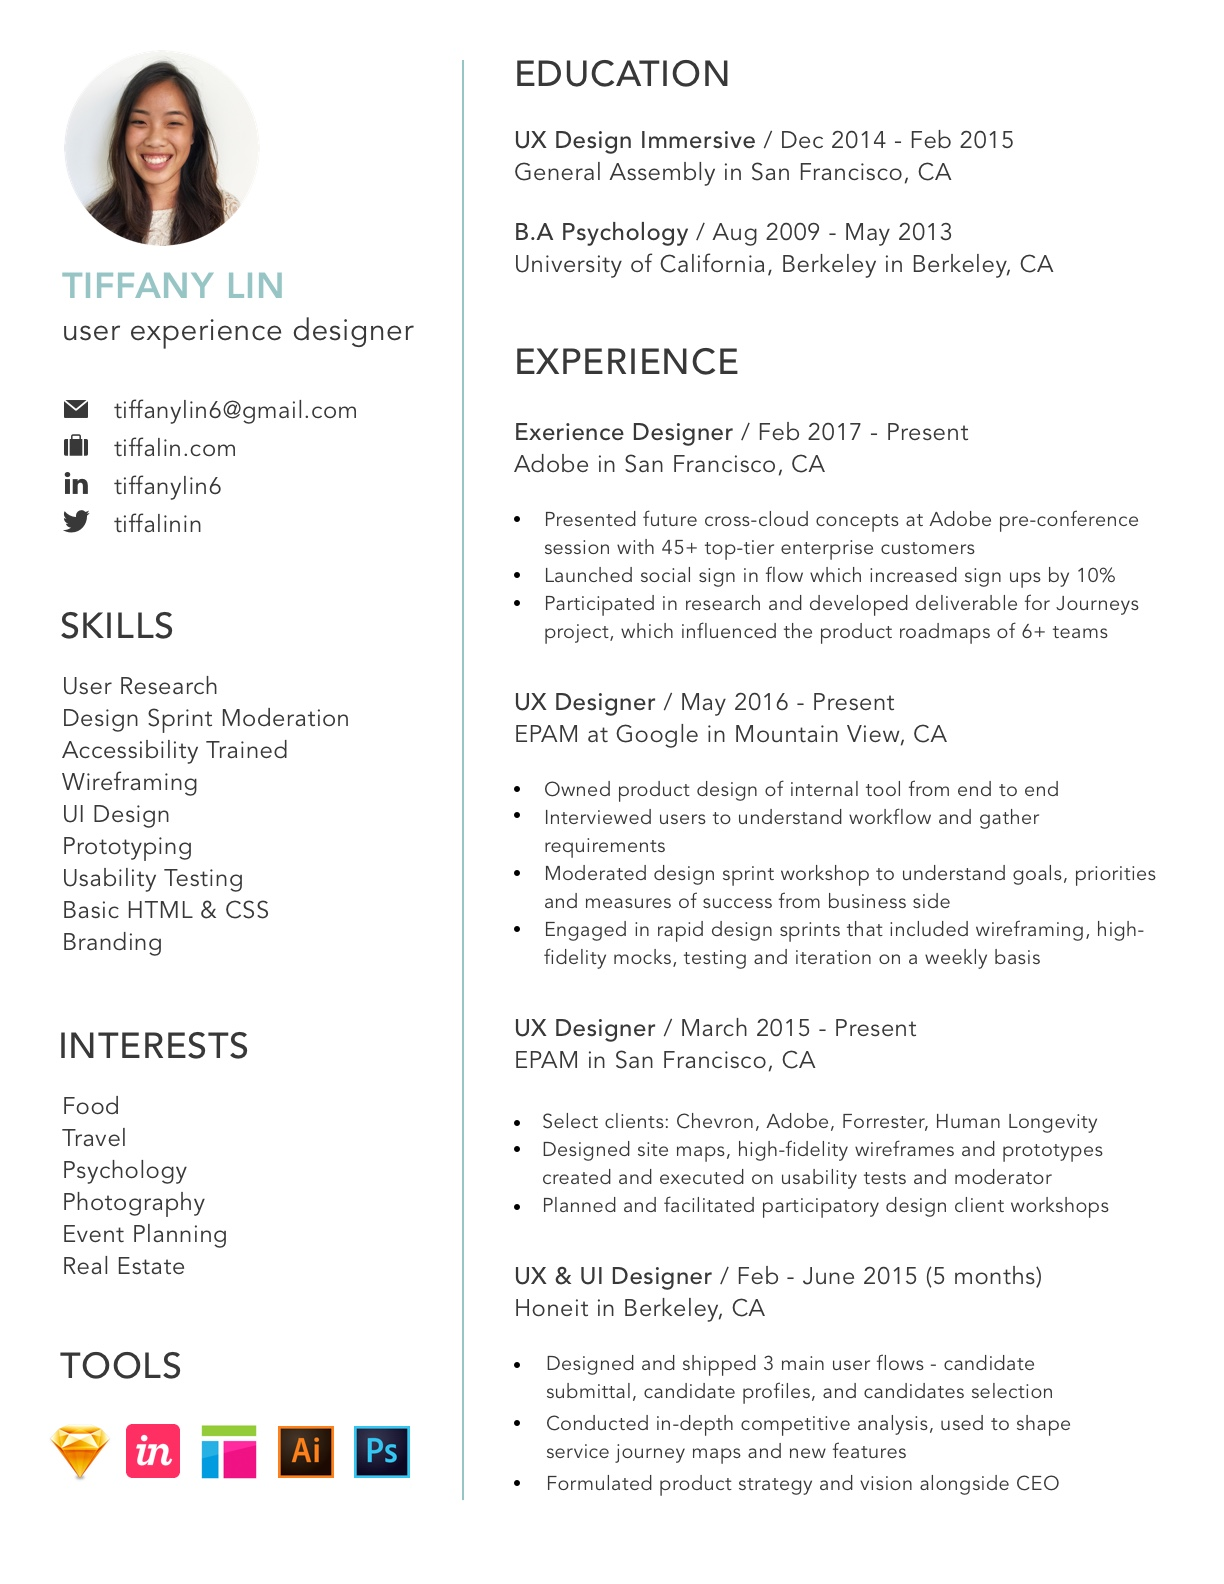 Resume_TiffanyLin_2017.jpg